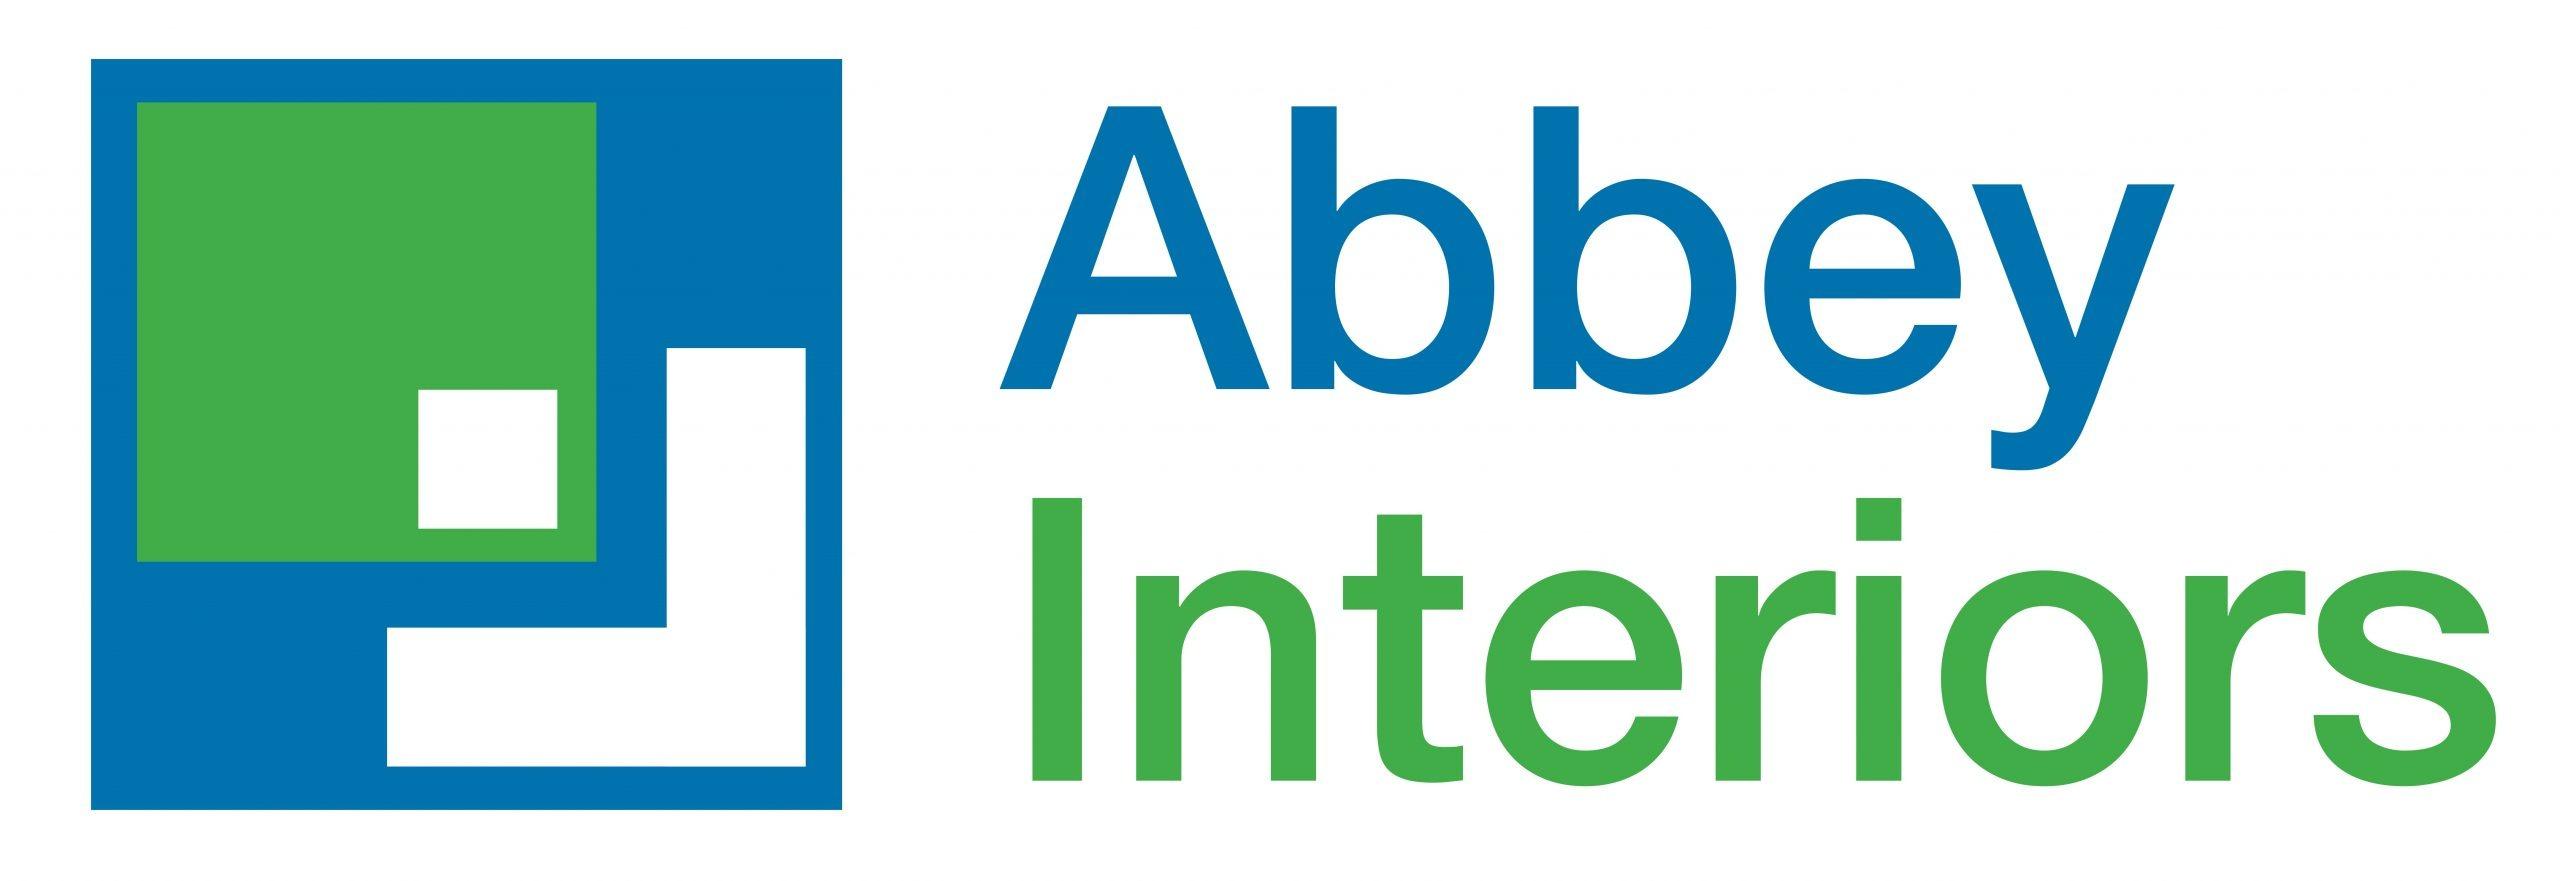 Abbey Interiors Kilkenny